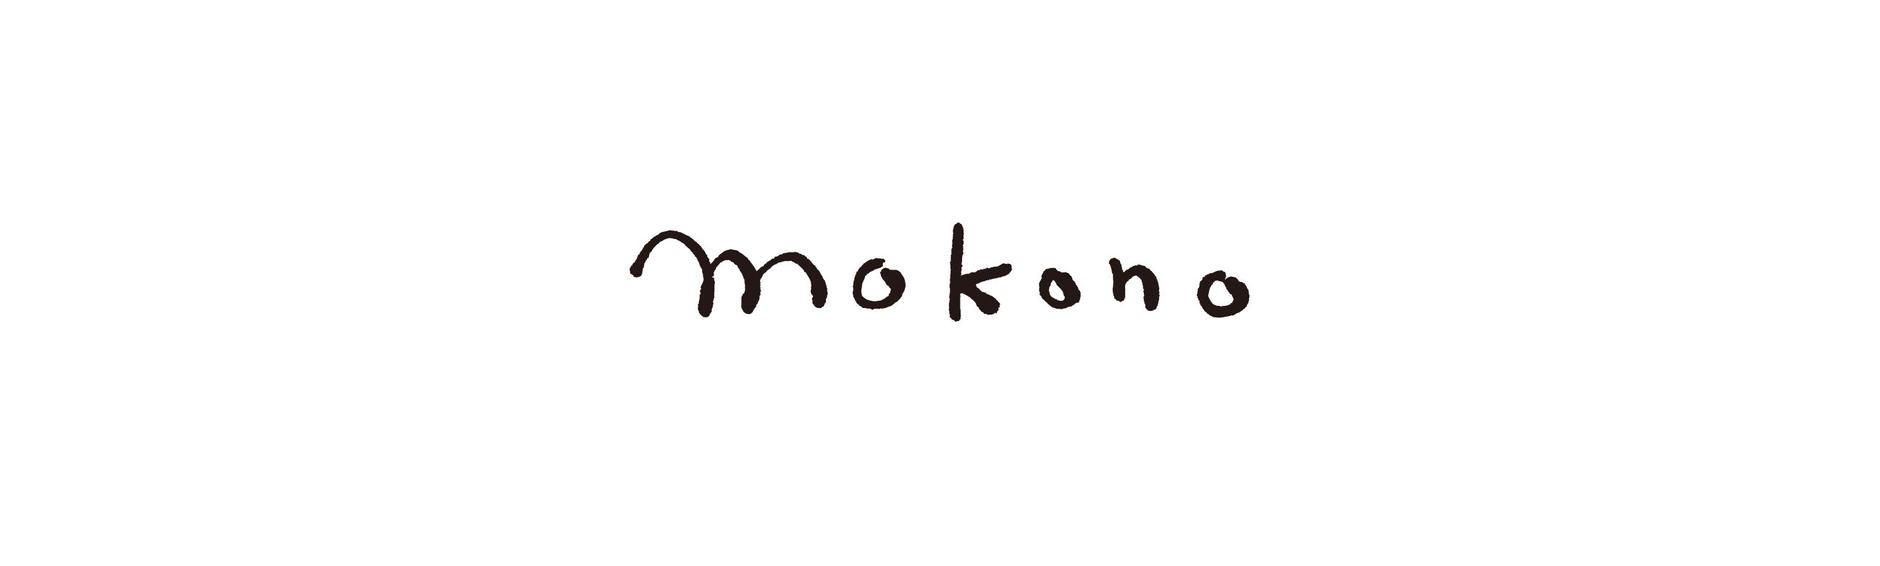 mokono web store